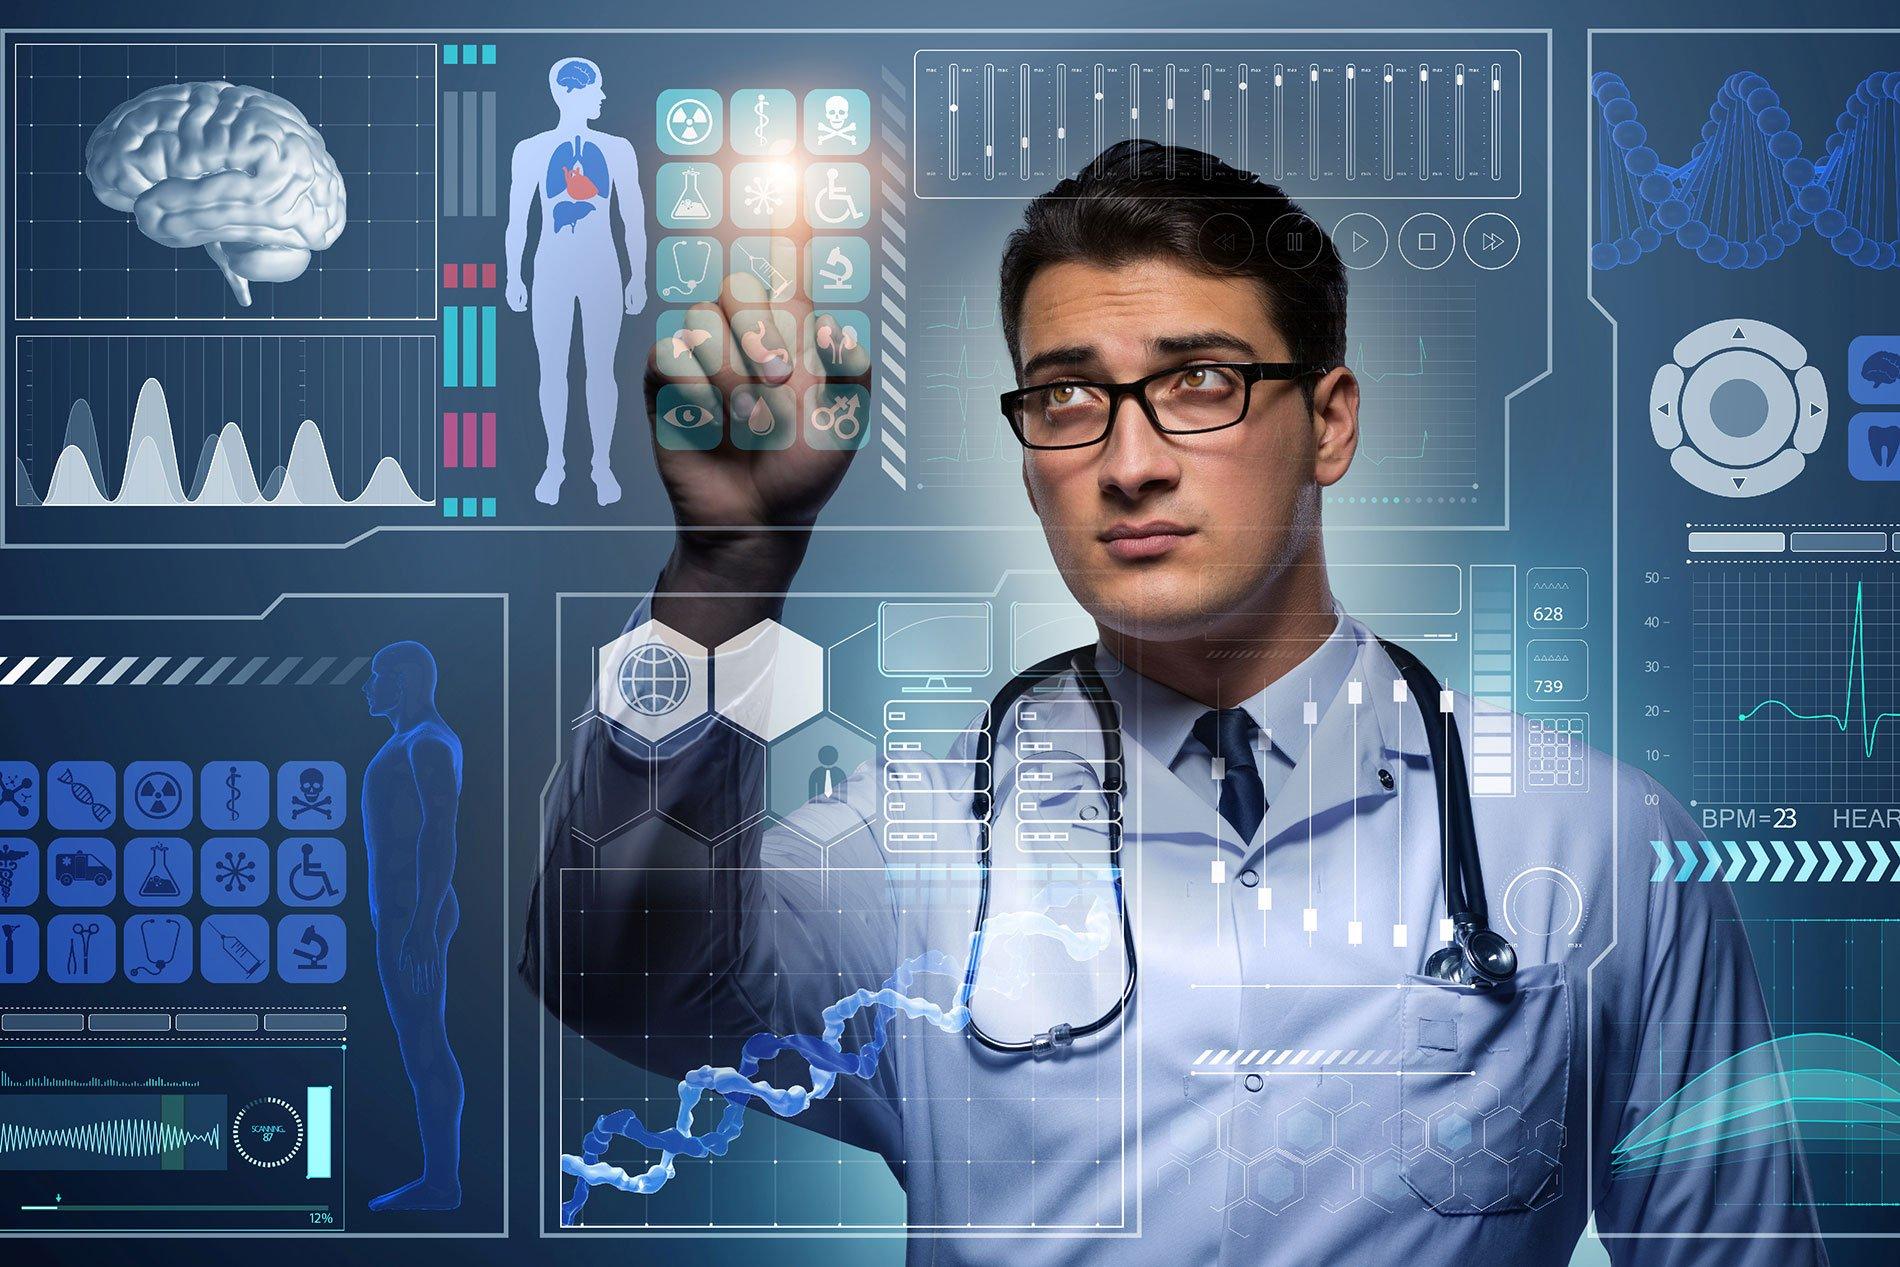 Doctor futuristic medical concept